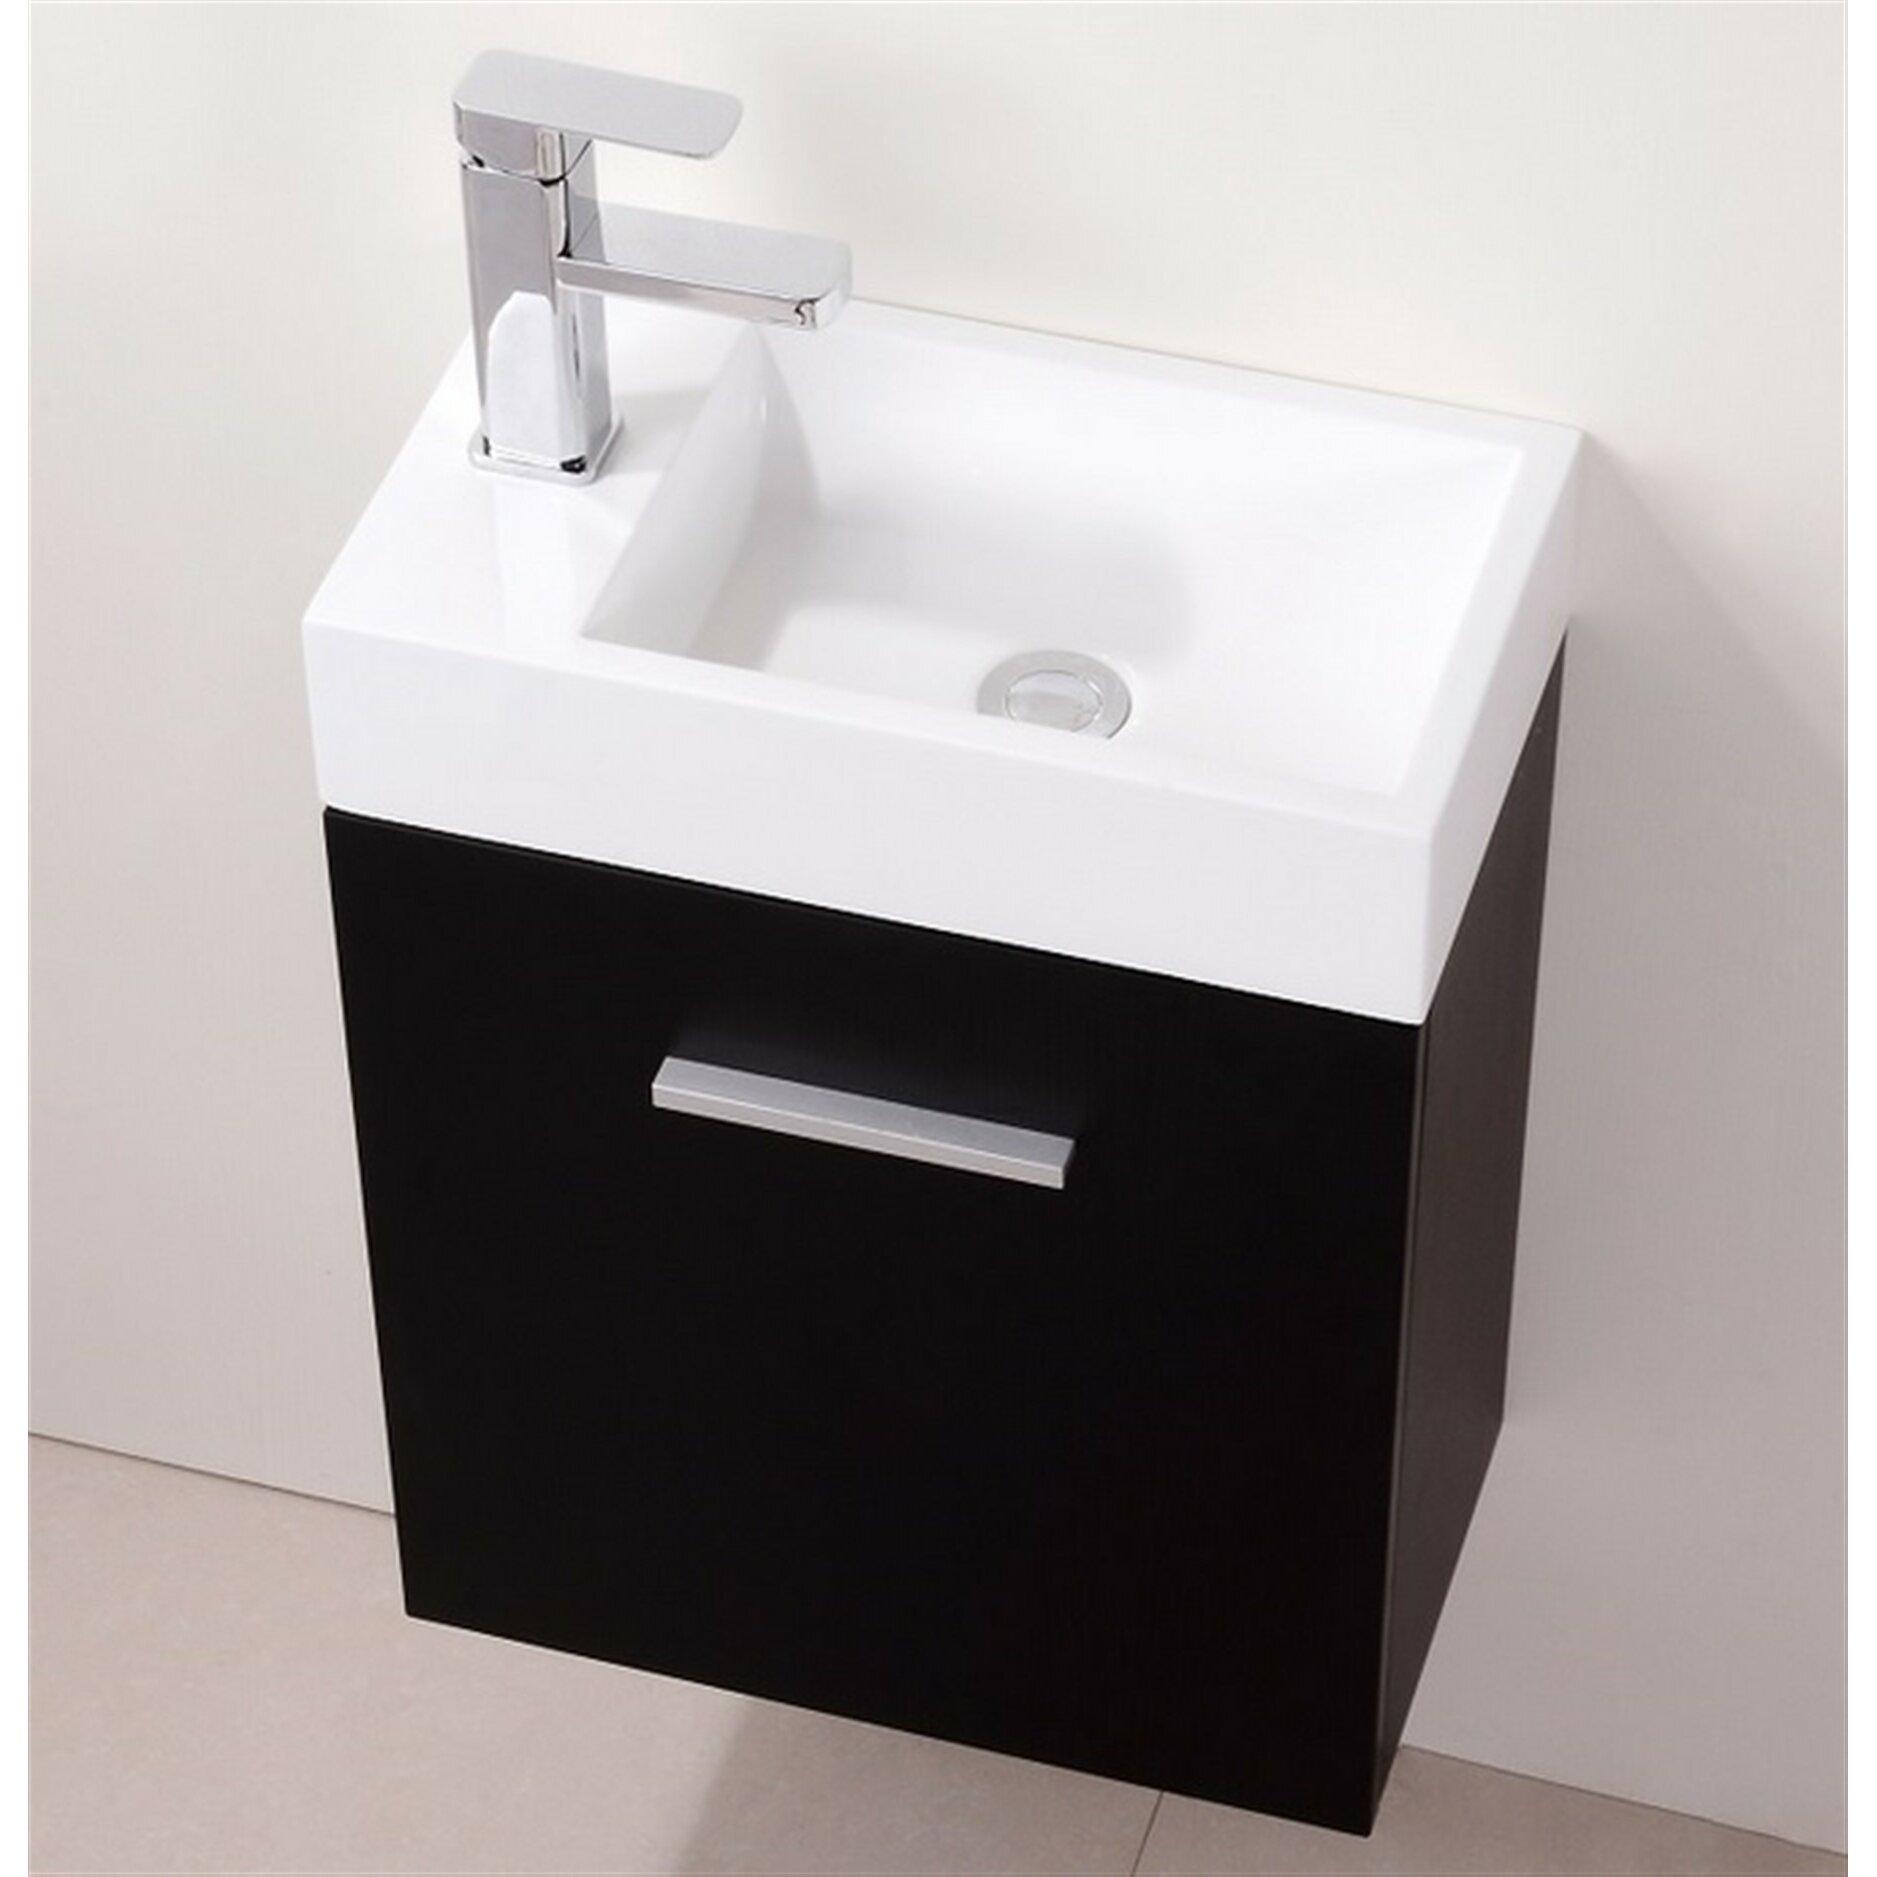 Kube bath bliss 18 single wall mount modern bathroom for Bath and vanity set